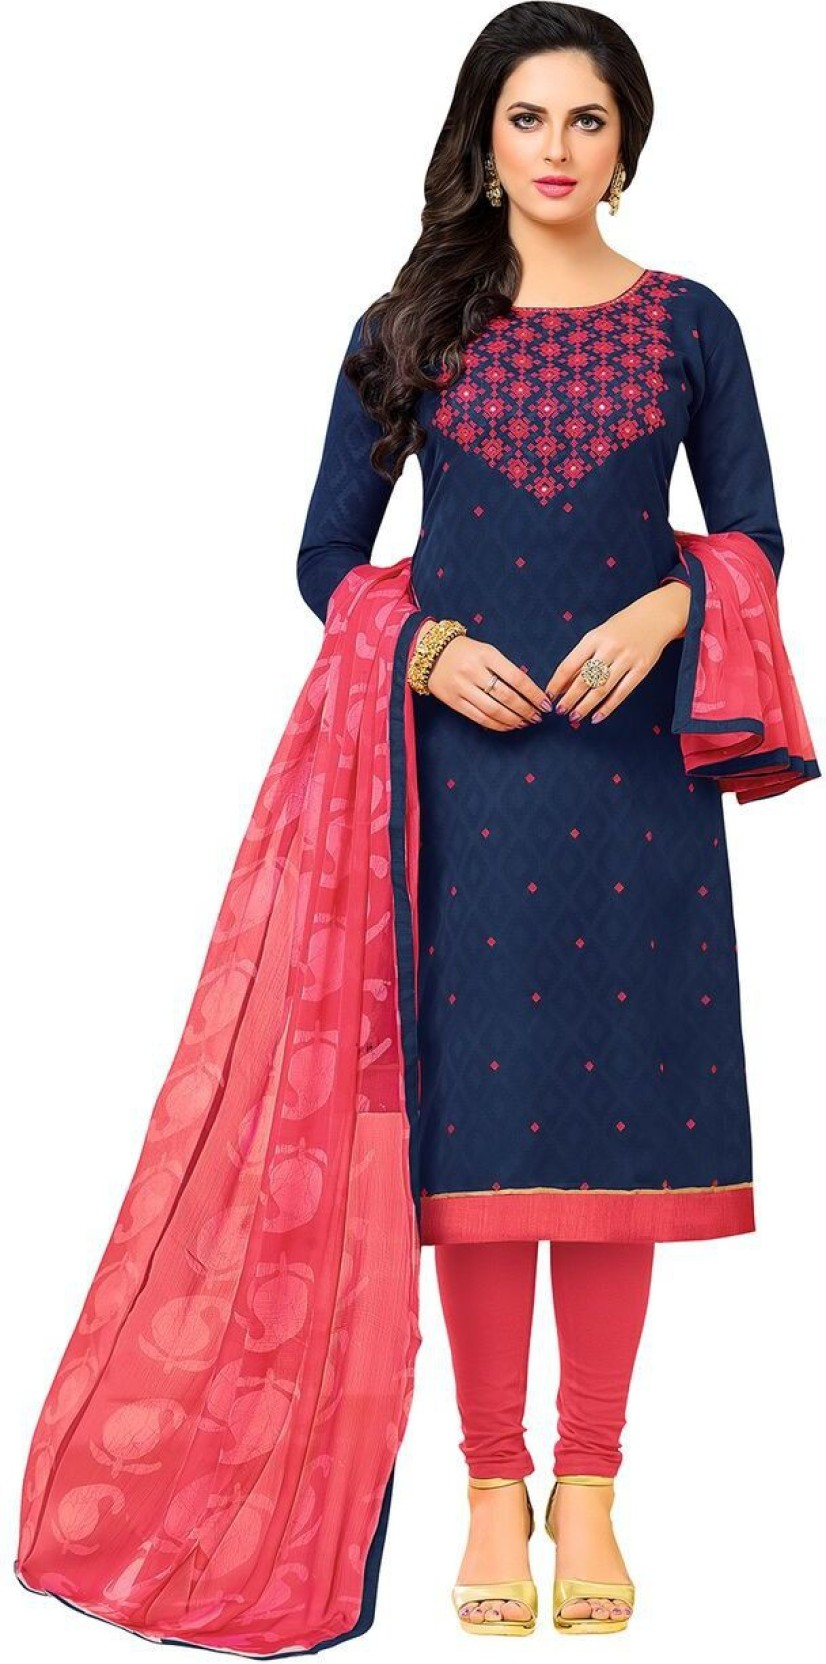 Ratnavati Jacquard Embroidered Salwar Suit Dupatta Material Price In Kody Beige Nokha Boot Women 39 On Offer